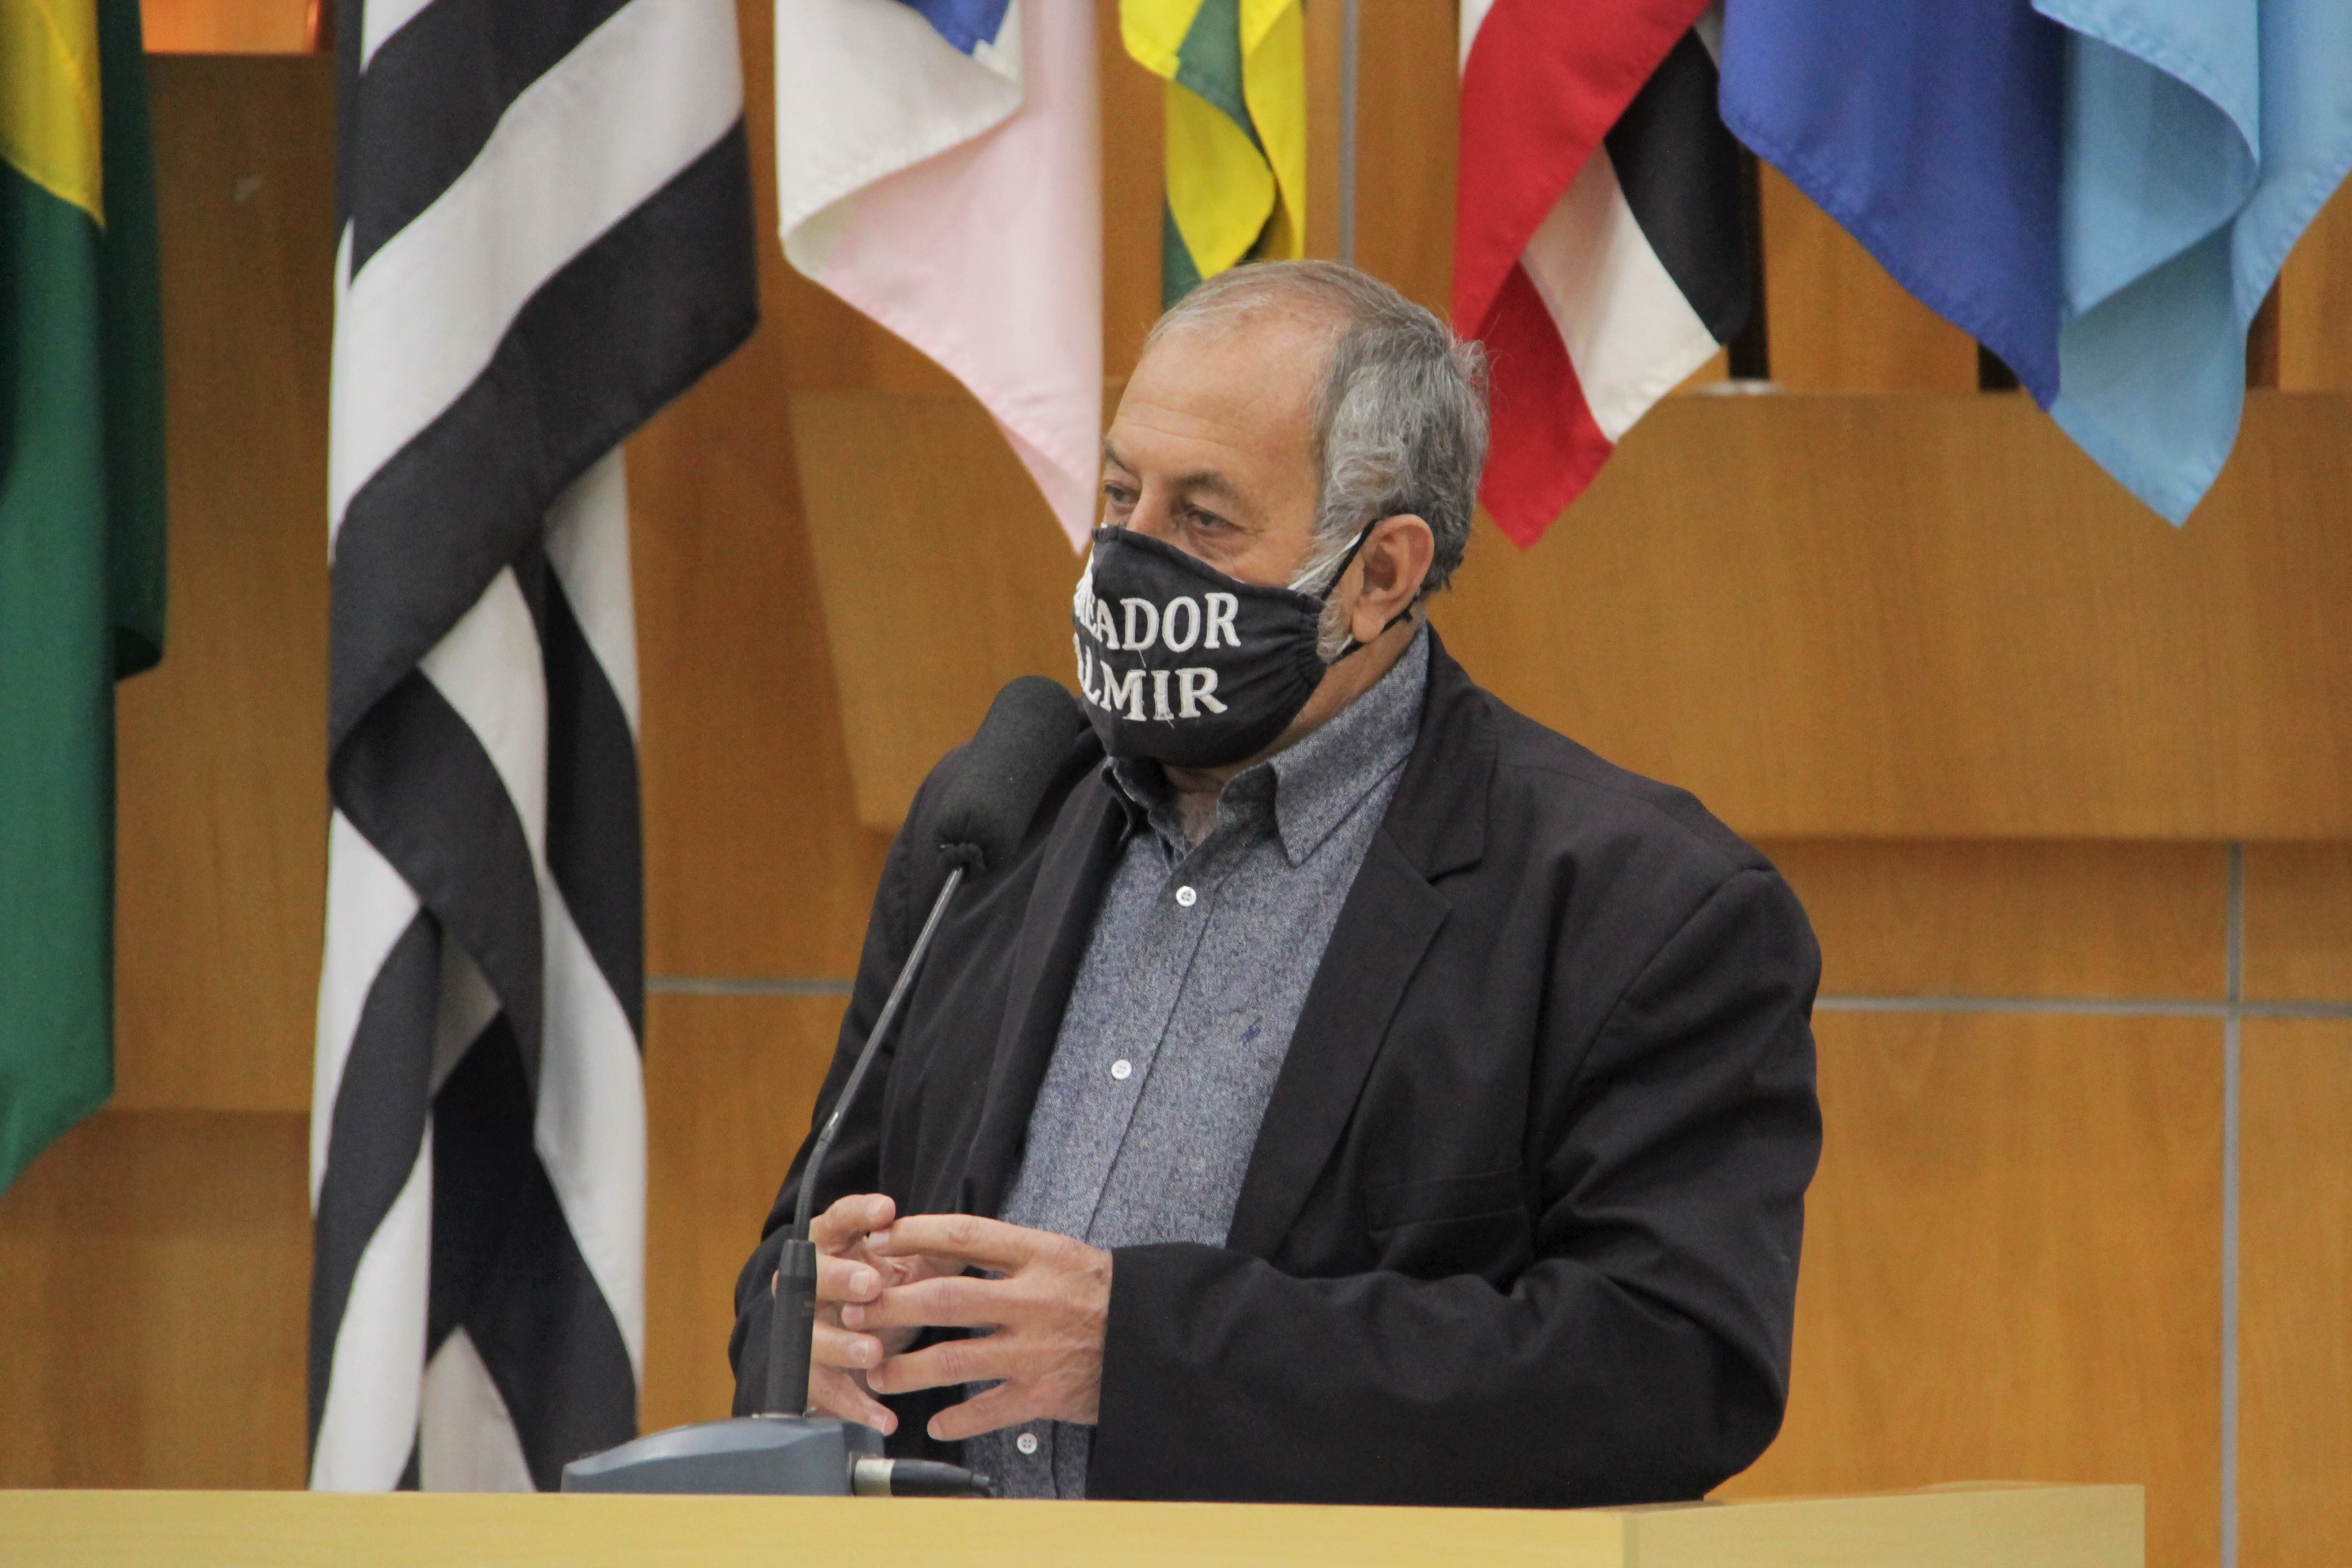 Valmir questiona repasse à Santa Casa para atendimento de pacientes de Santa Branca e Igaratá